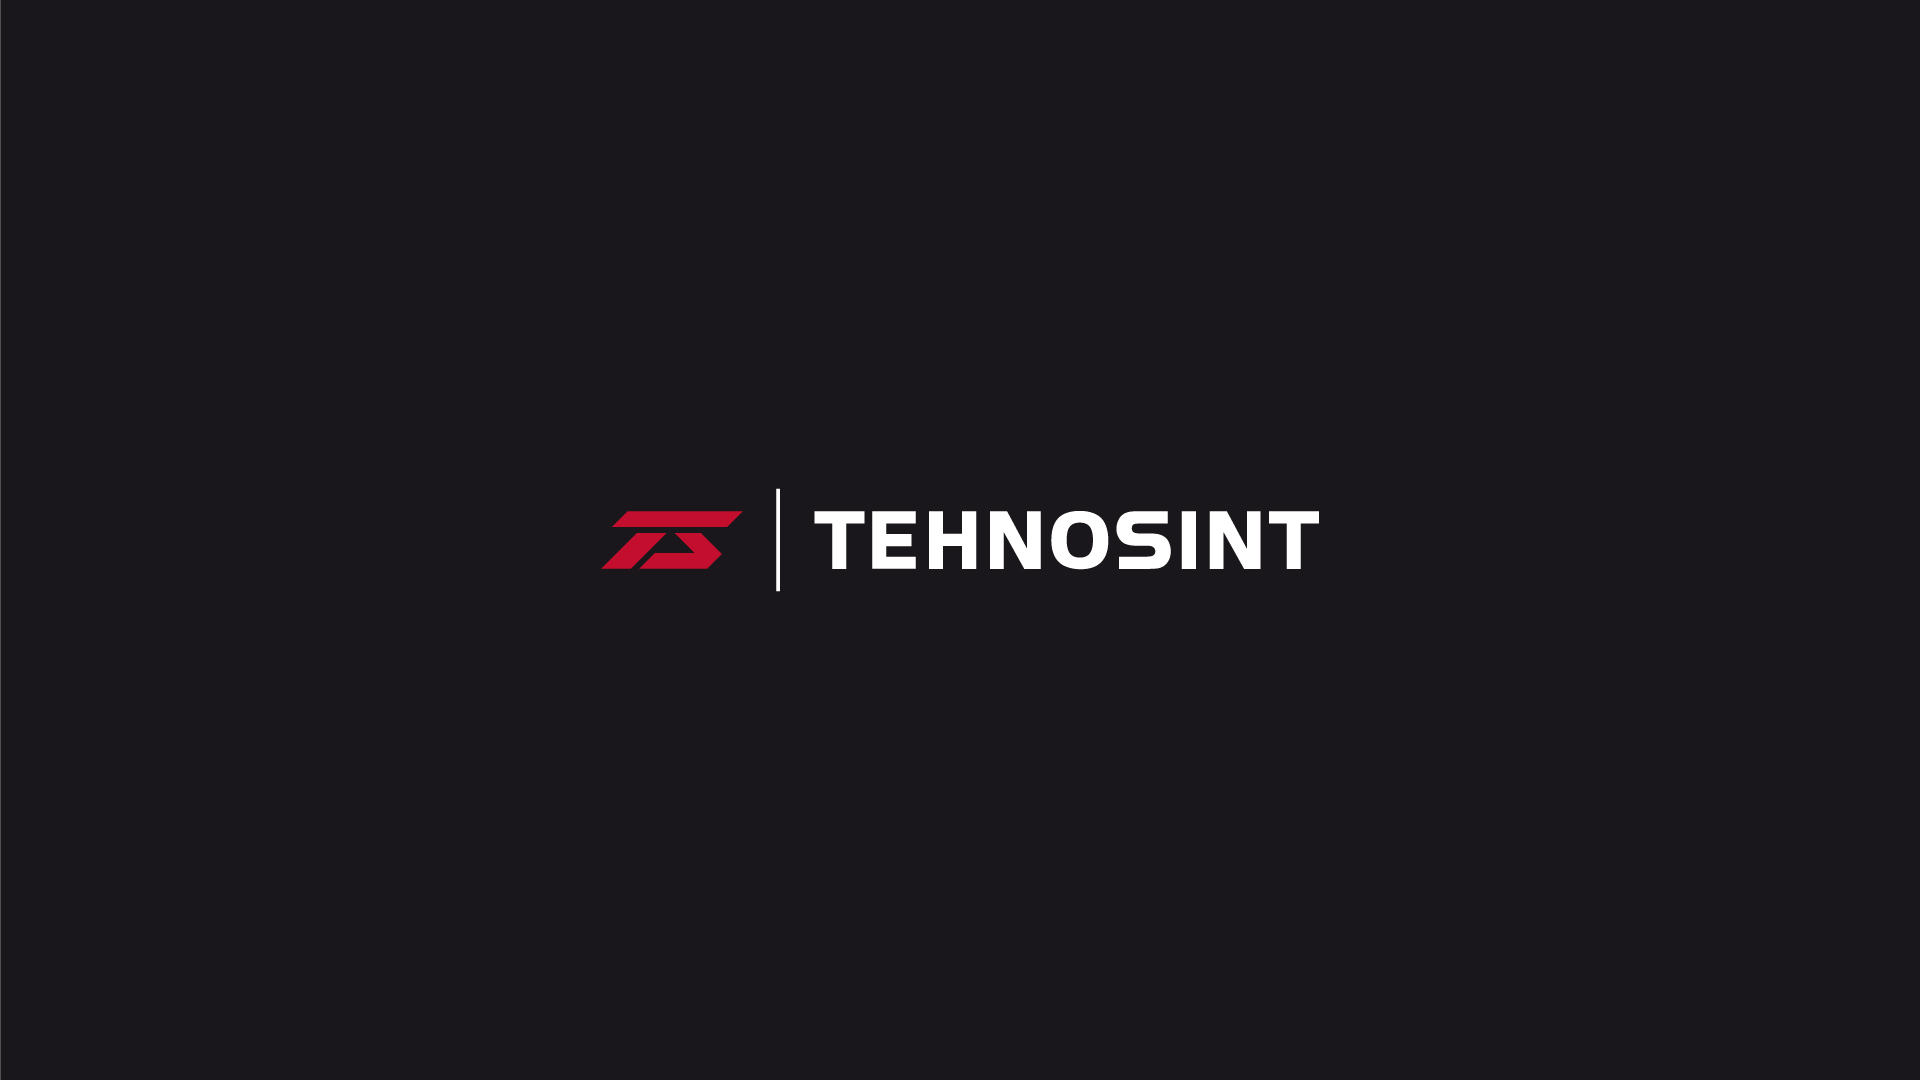 Tehnosint